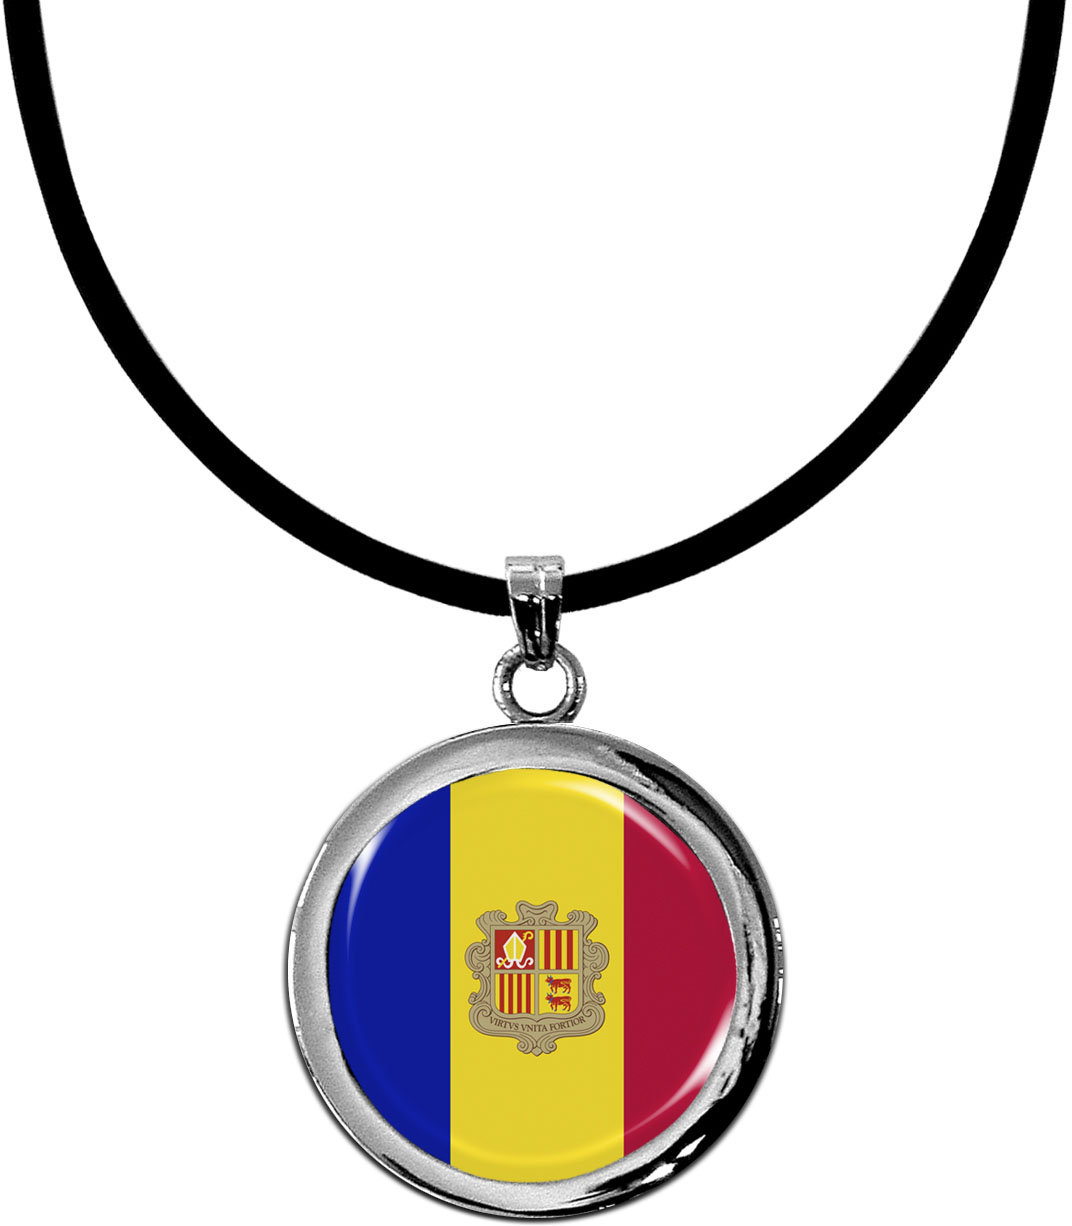 Kettenanhänger / Andorra / Silikonband mit Silberverschluss